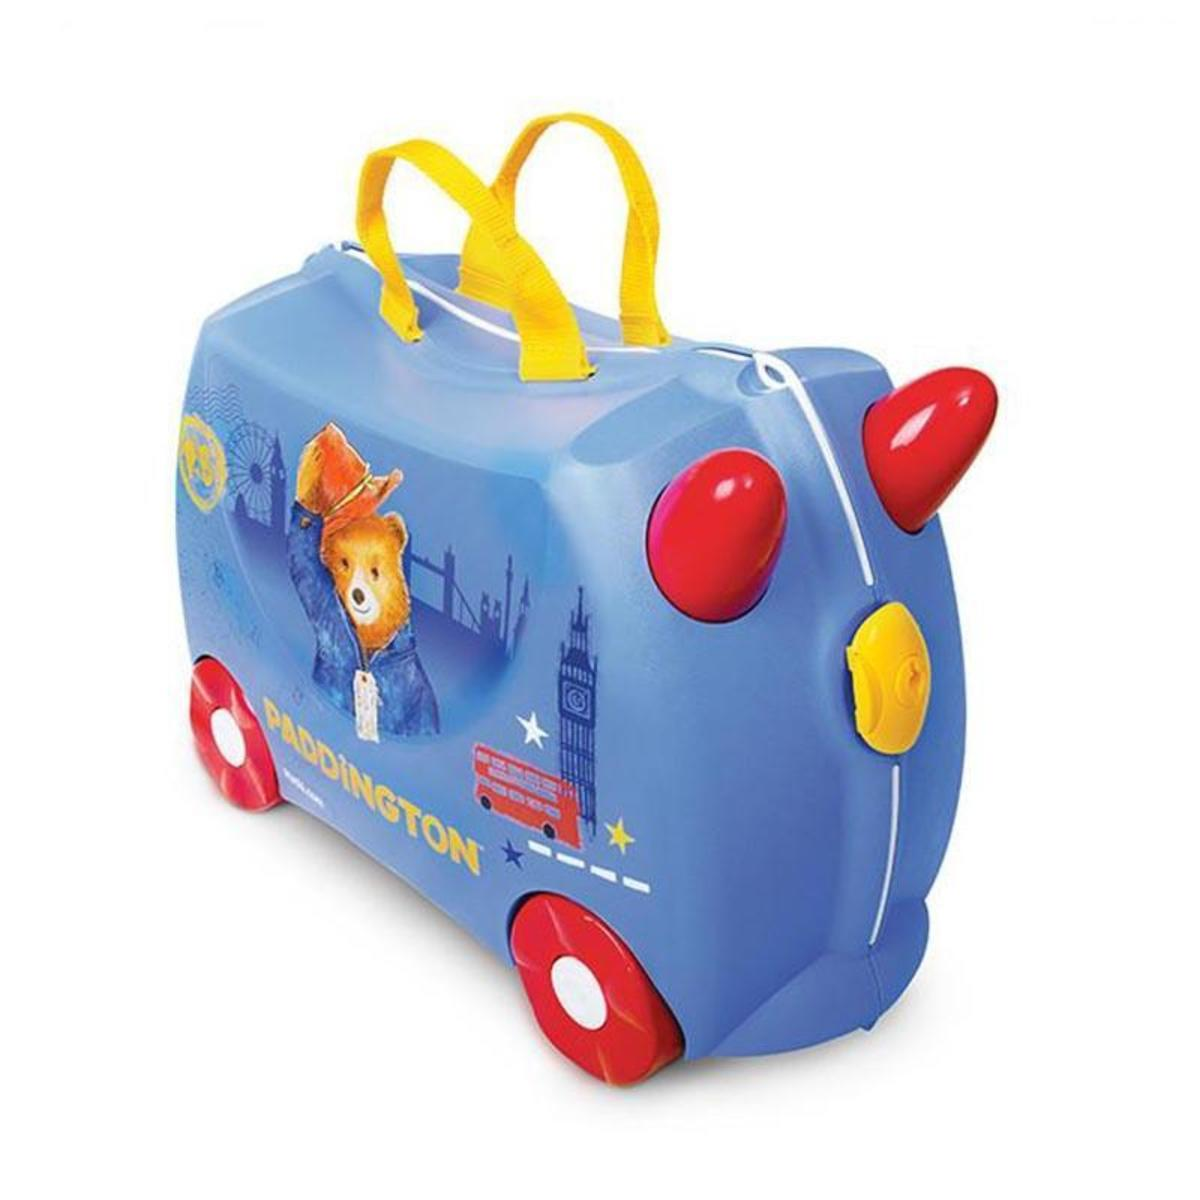 Trunki Kids Luggage (various) - Paddington